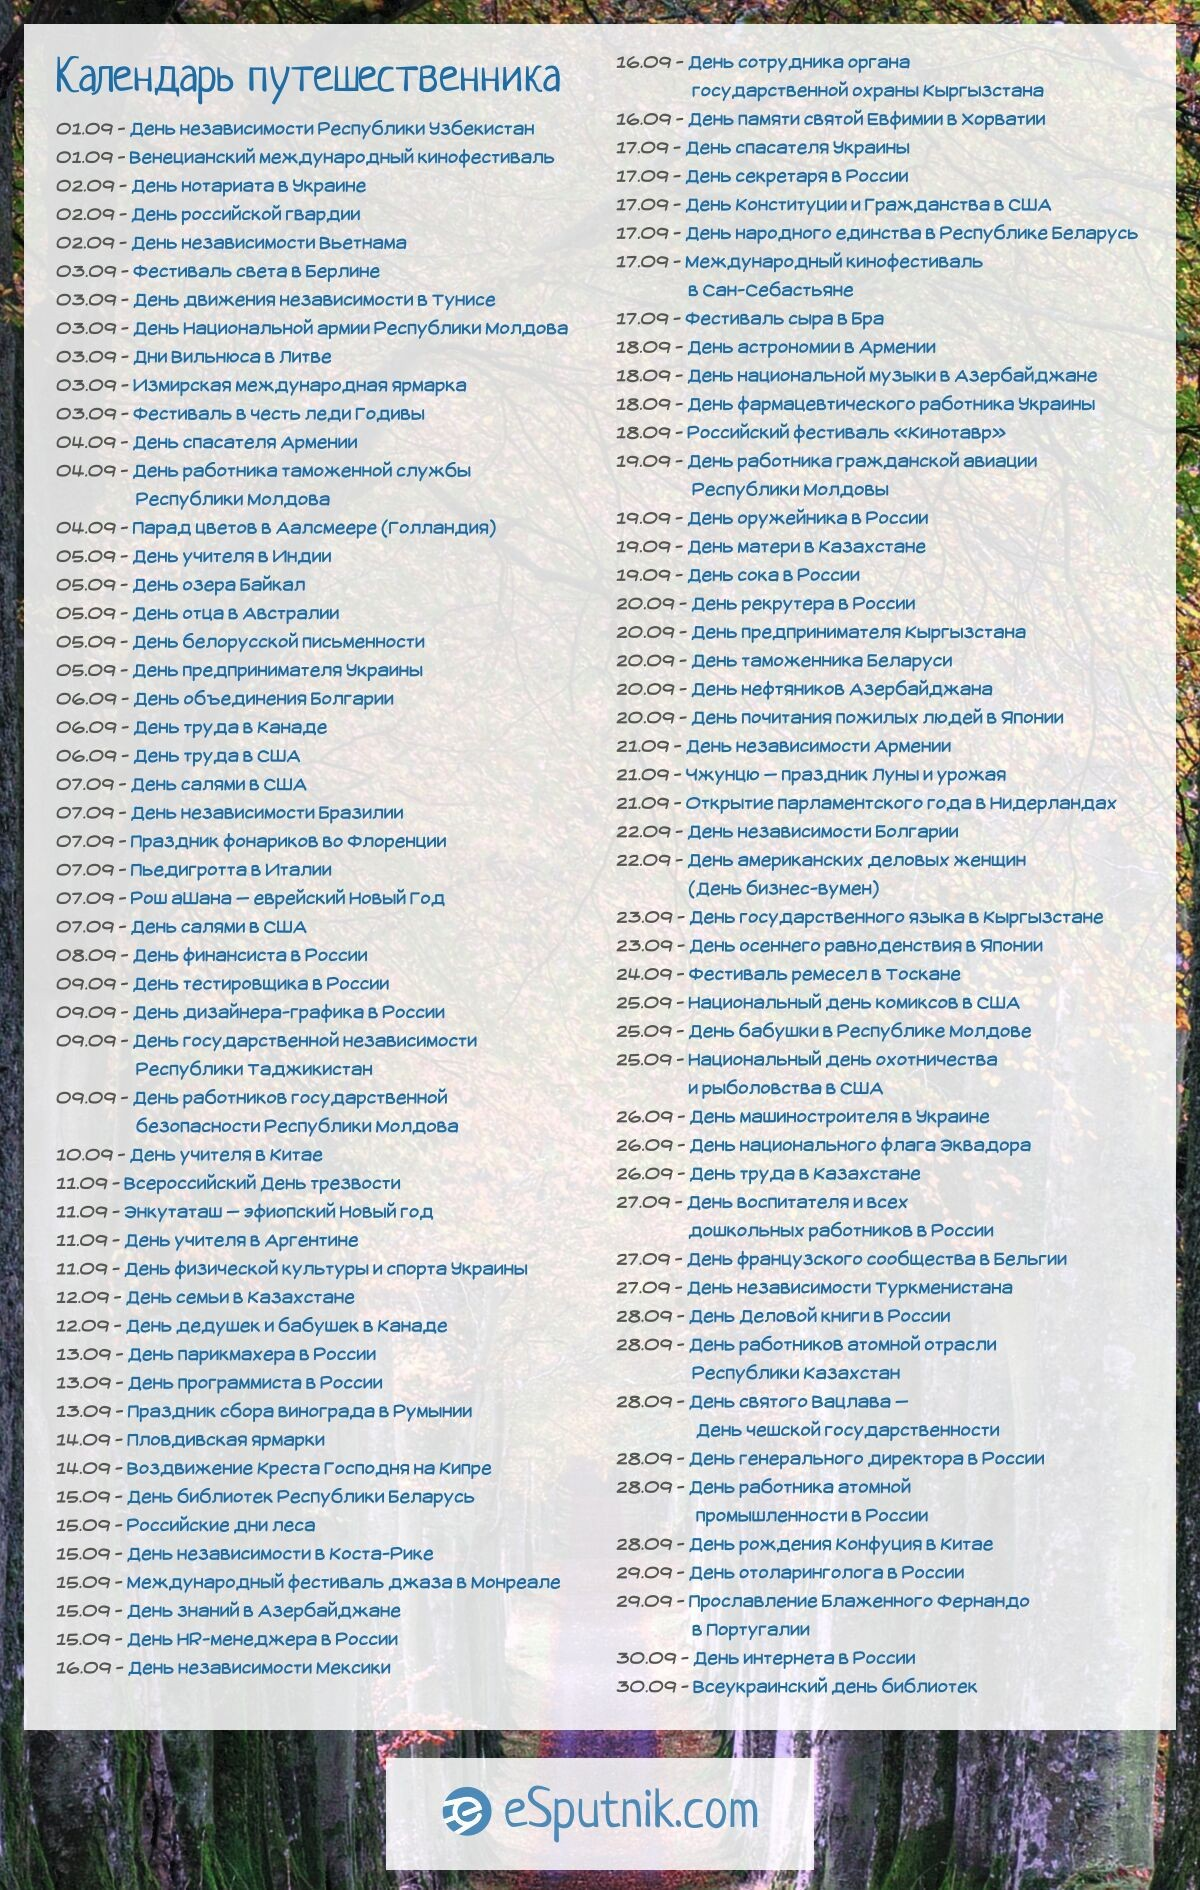 Календарь путешественника